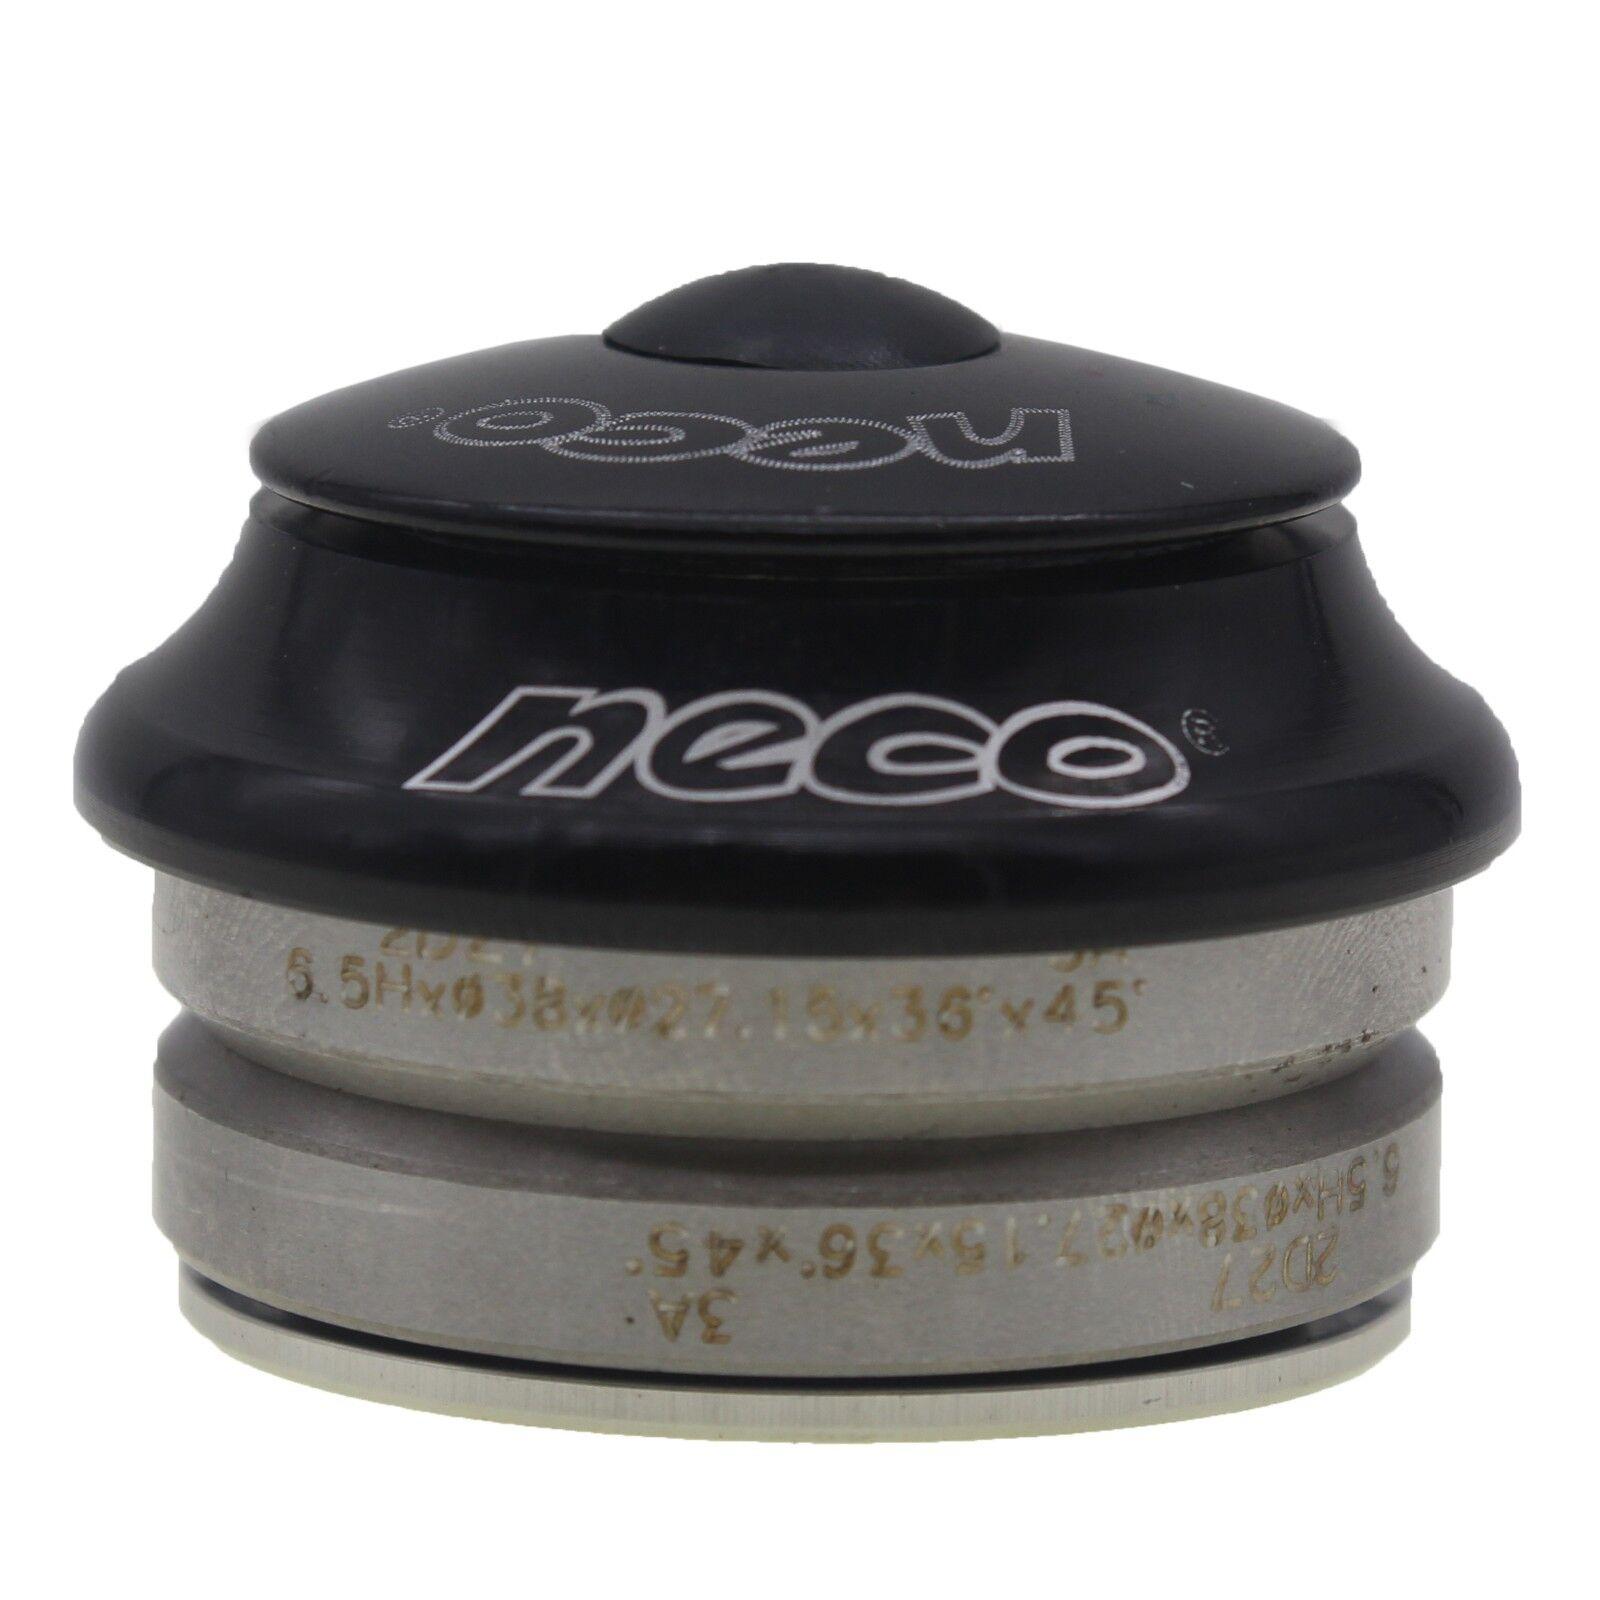 Neco 1 25 4mm Integrated Bike Headset 38mm Bearing Silver Ebay